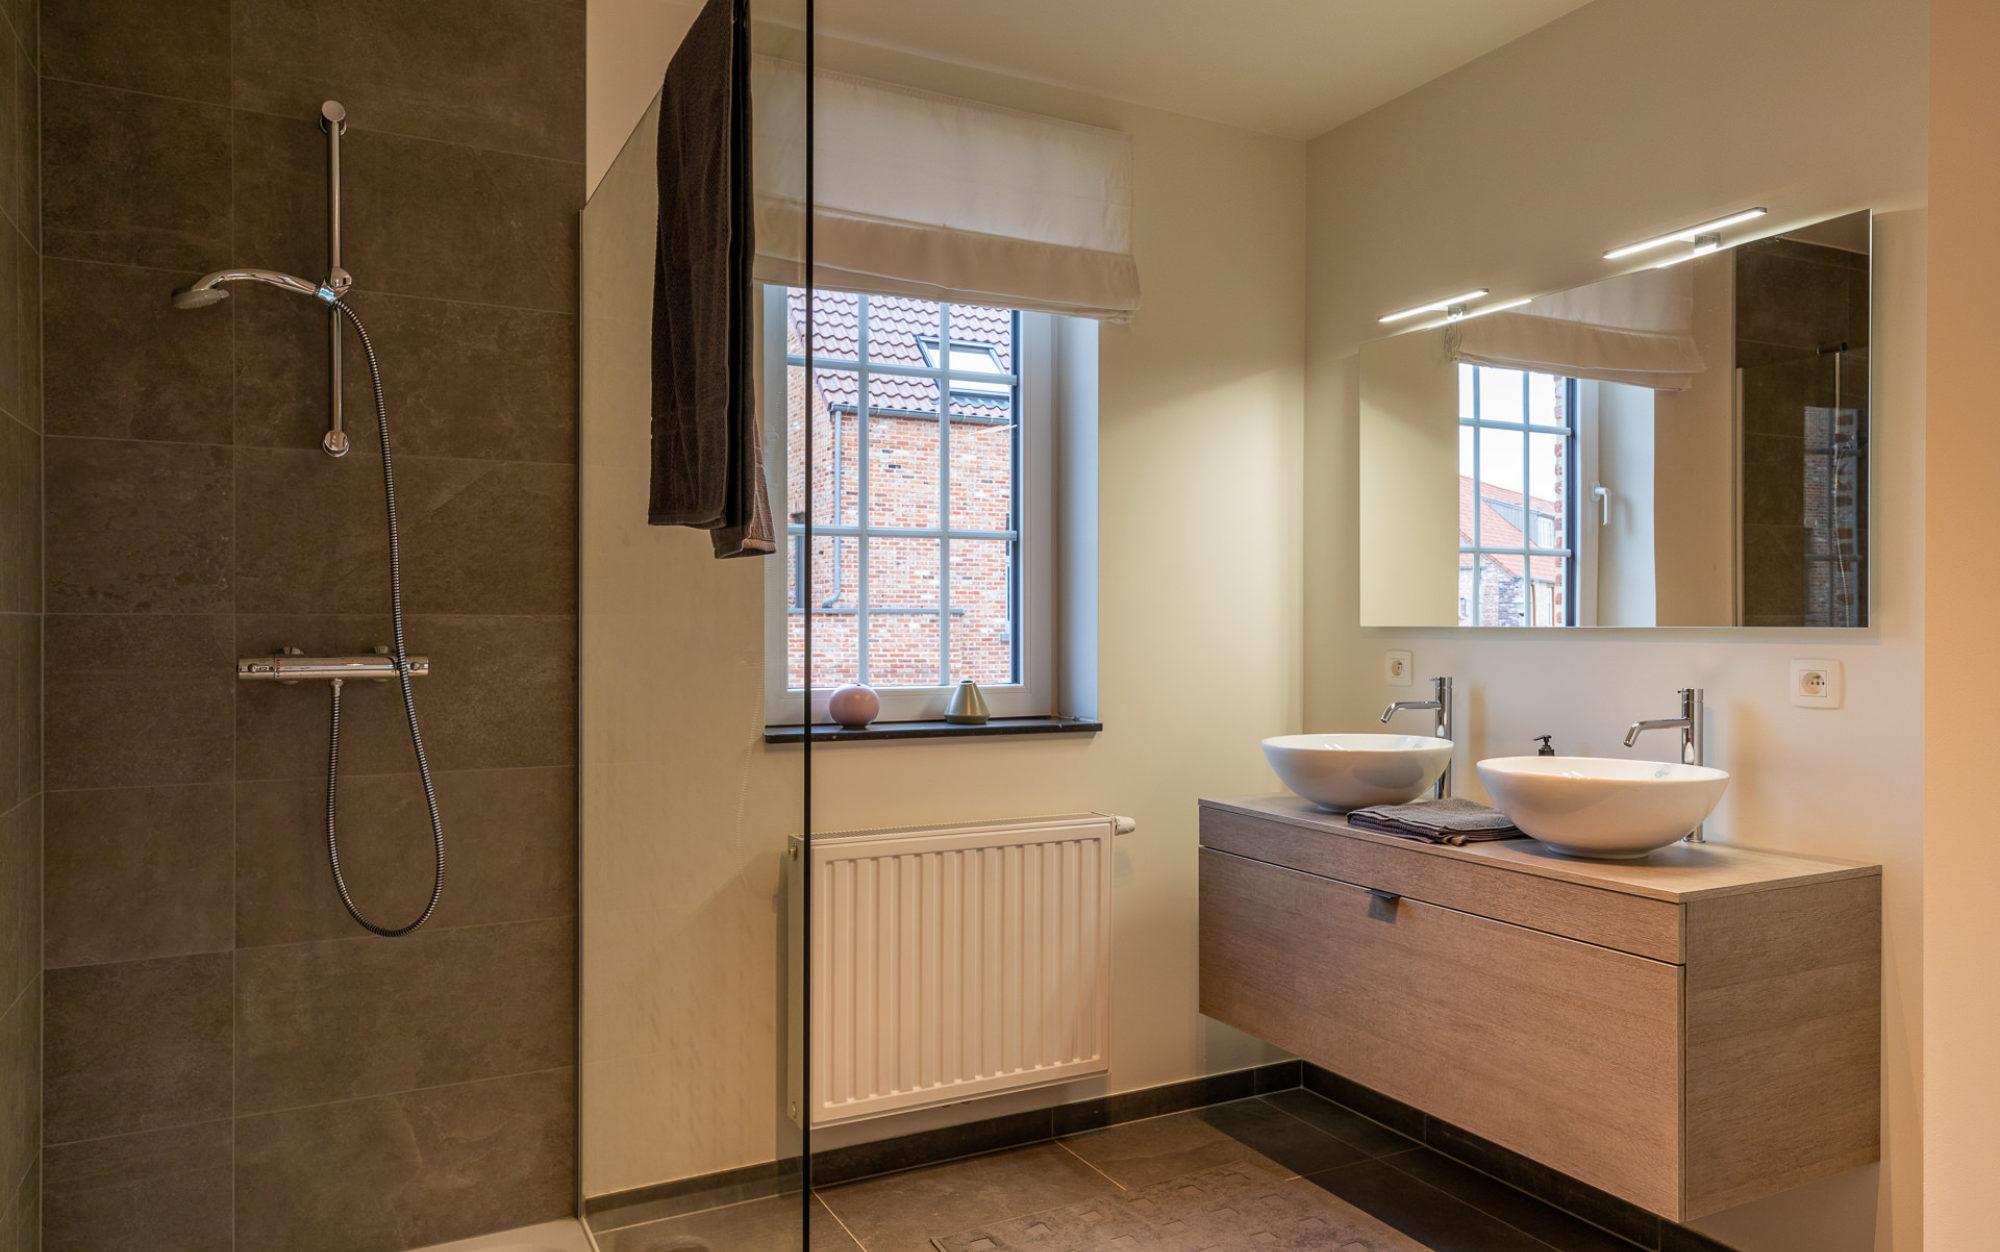 Interieur badkamer